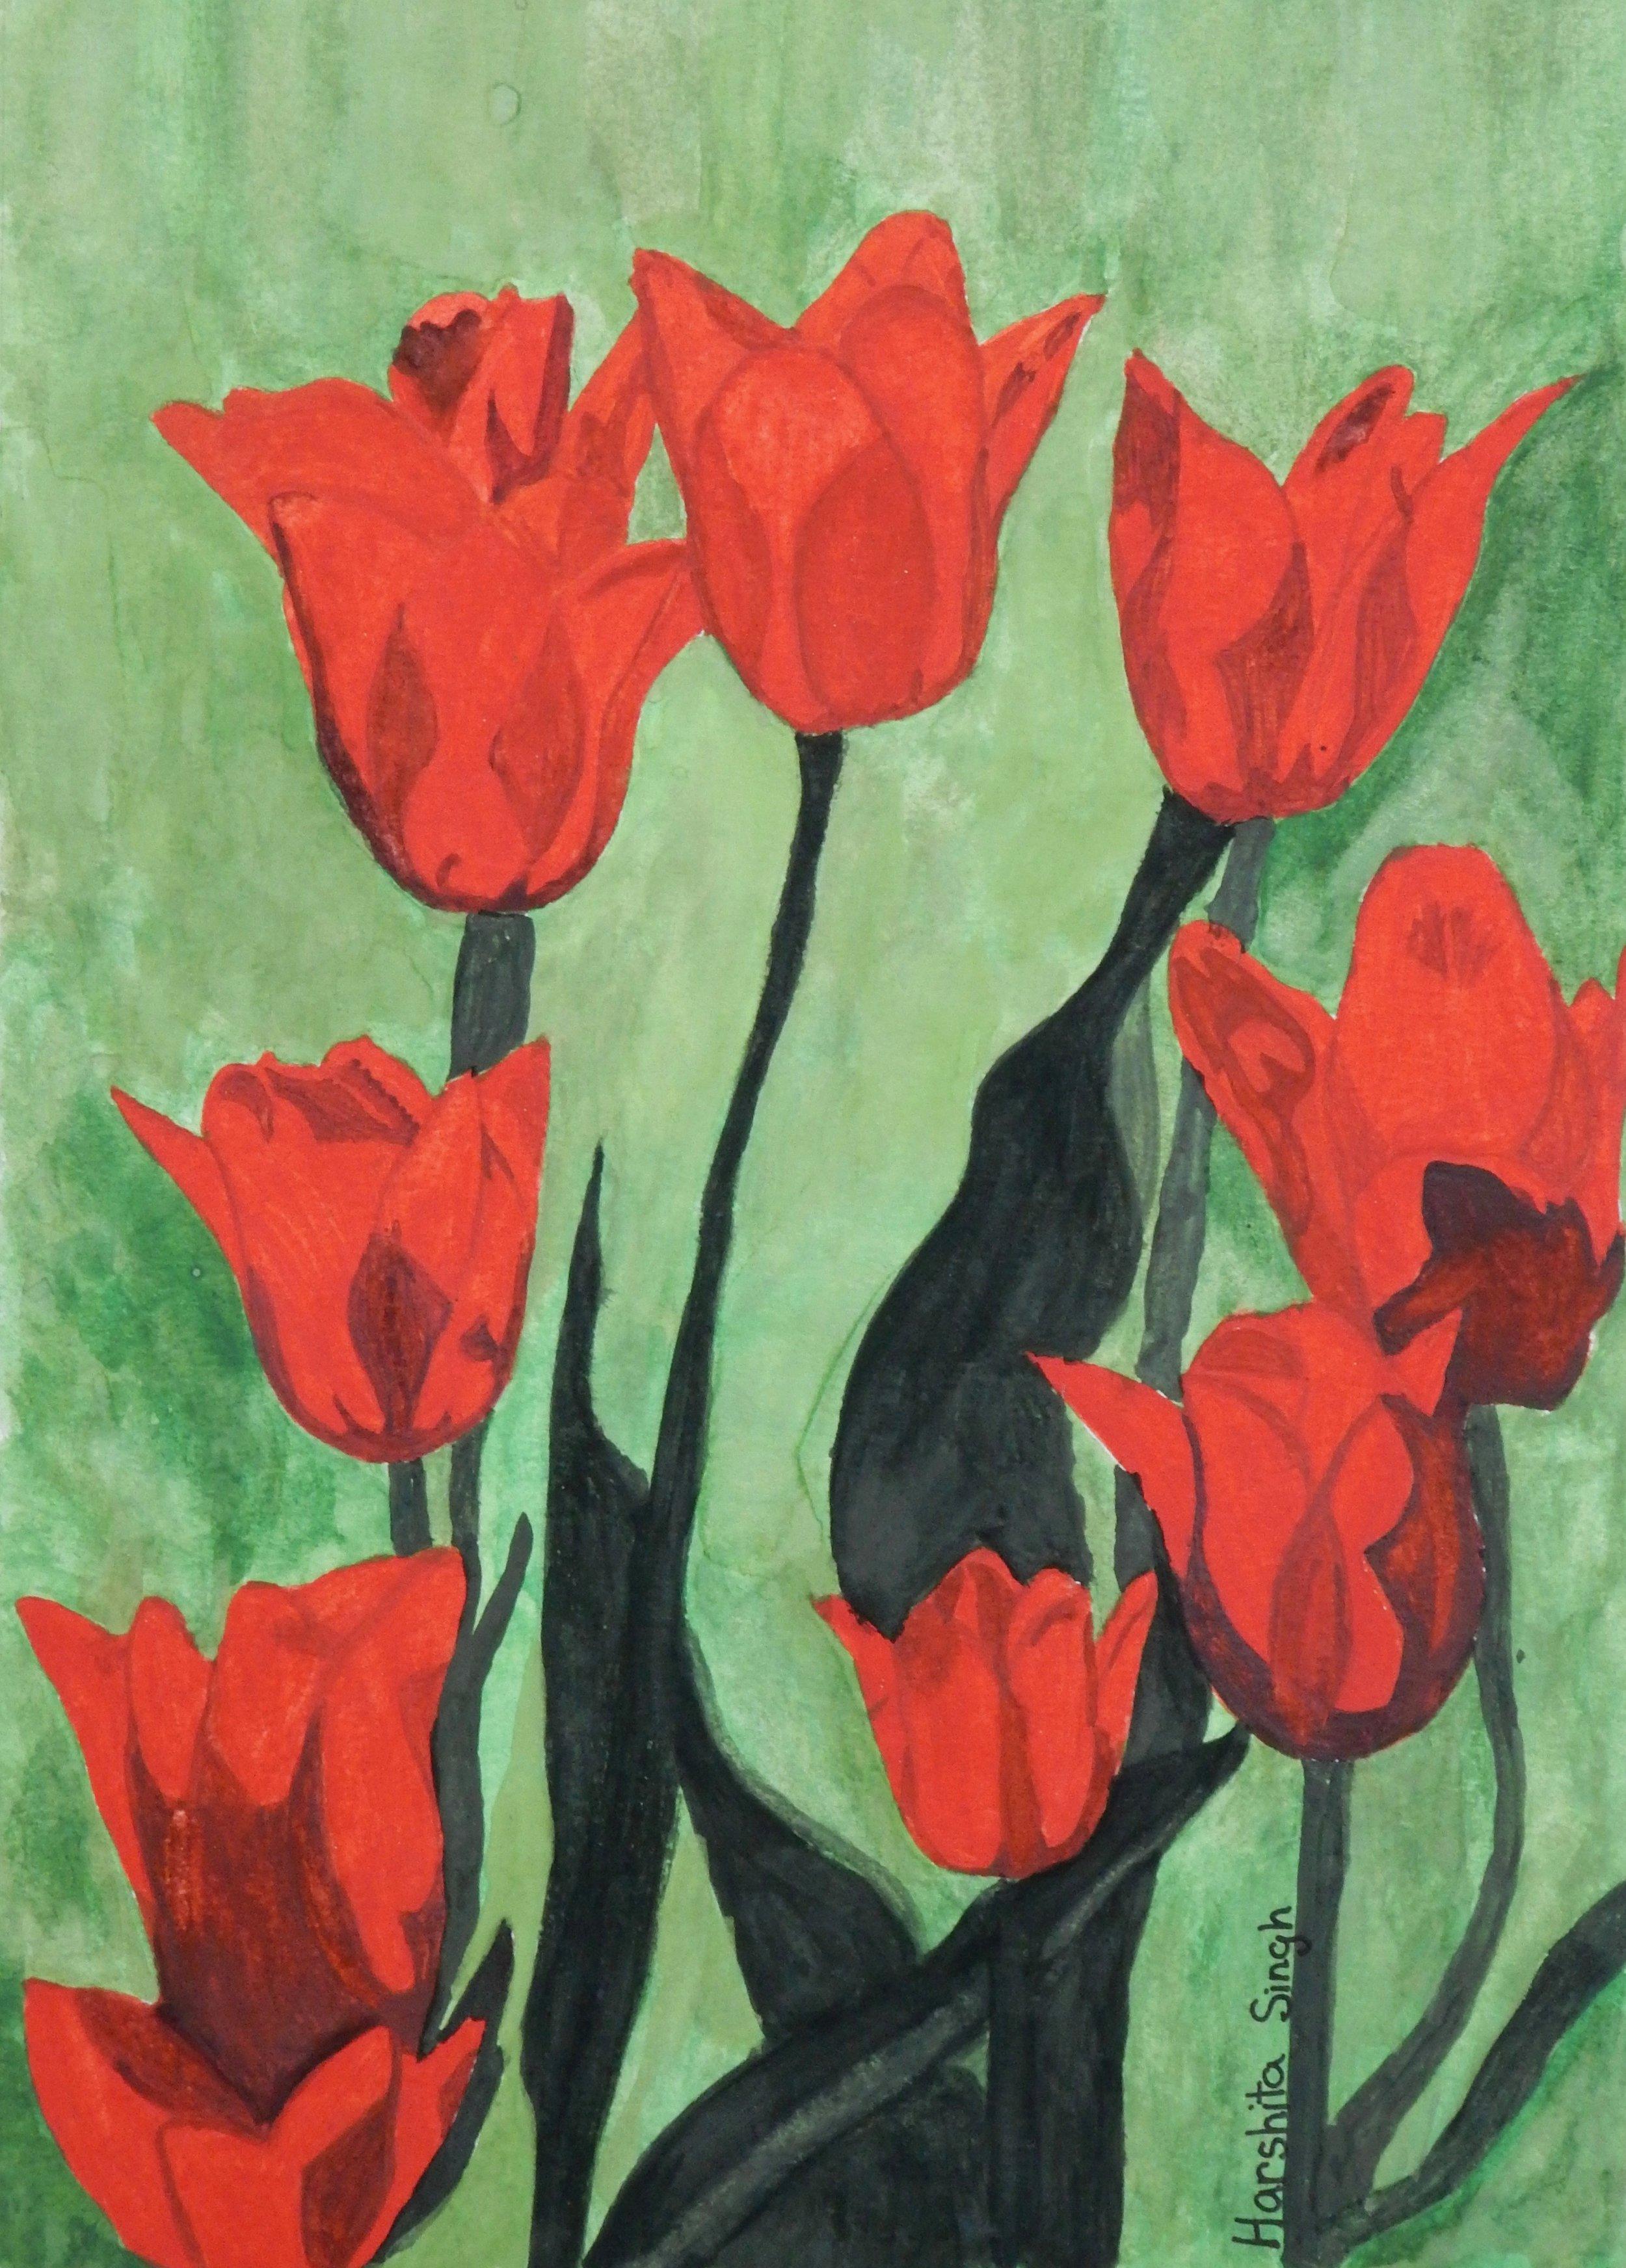 Harshita Singh.11 yrs.watercolor.Tulips